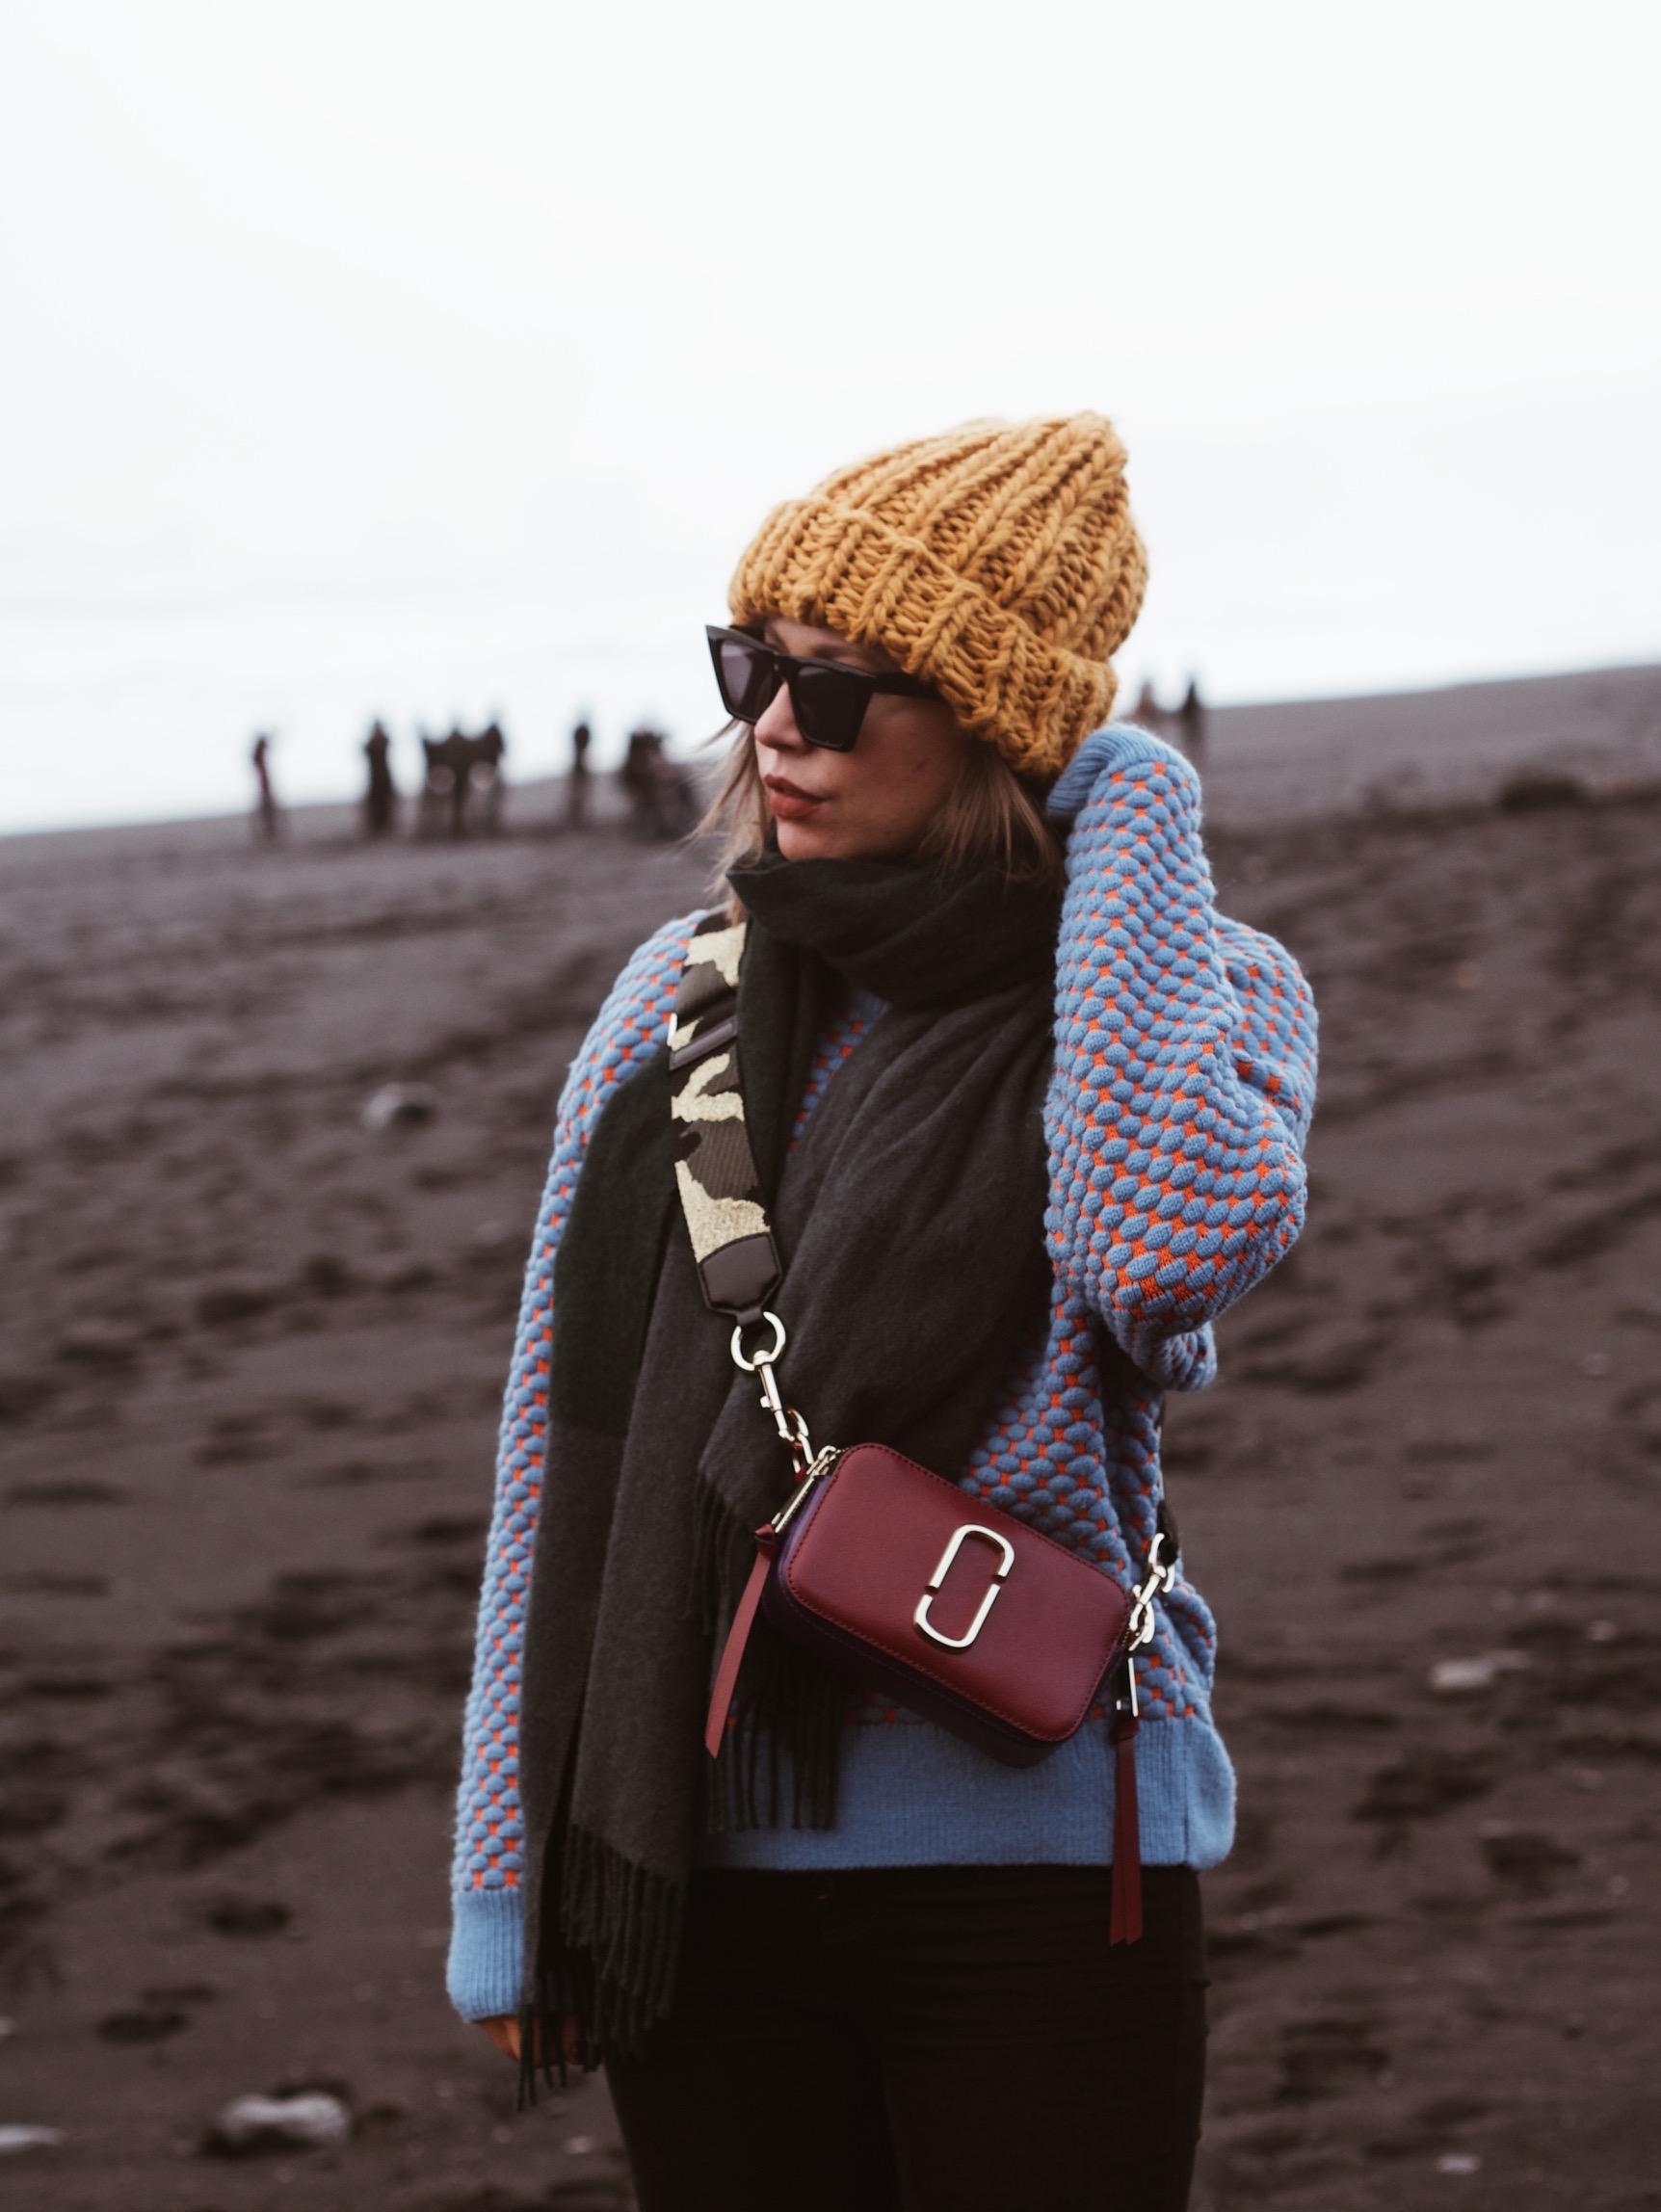 manchester fashion blogger, manchester bloggers, travel blogger, Reykjavik, Iceland Reykjavik, visit Reykjavik, visit Reykjavik, fashion blogger, glasier